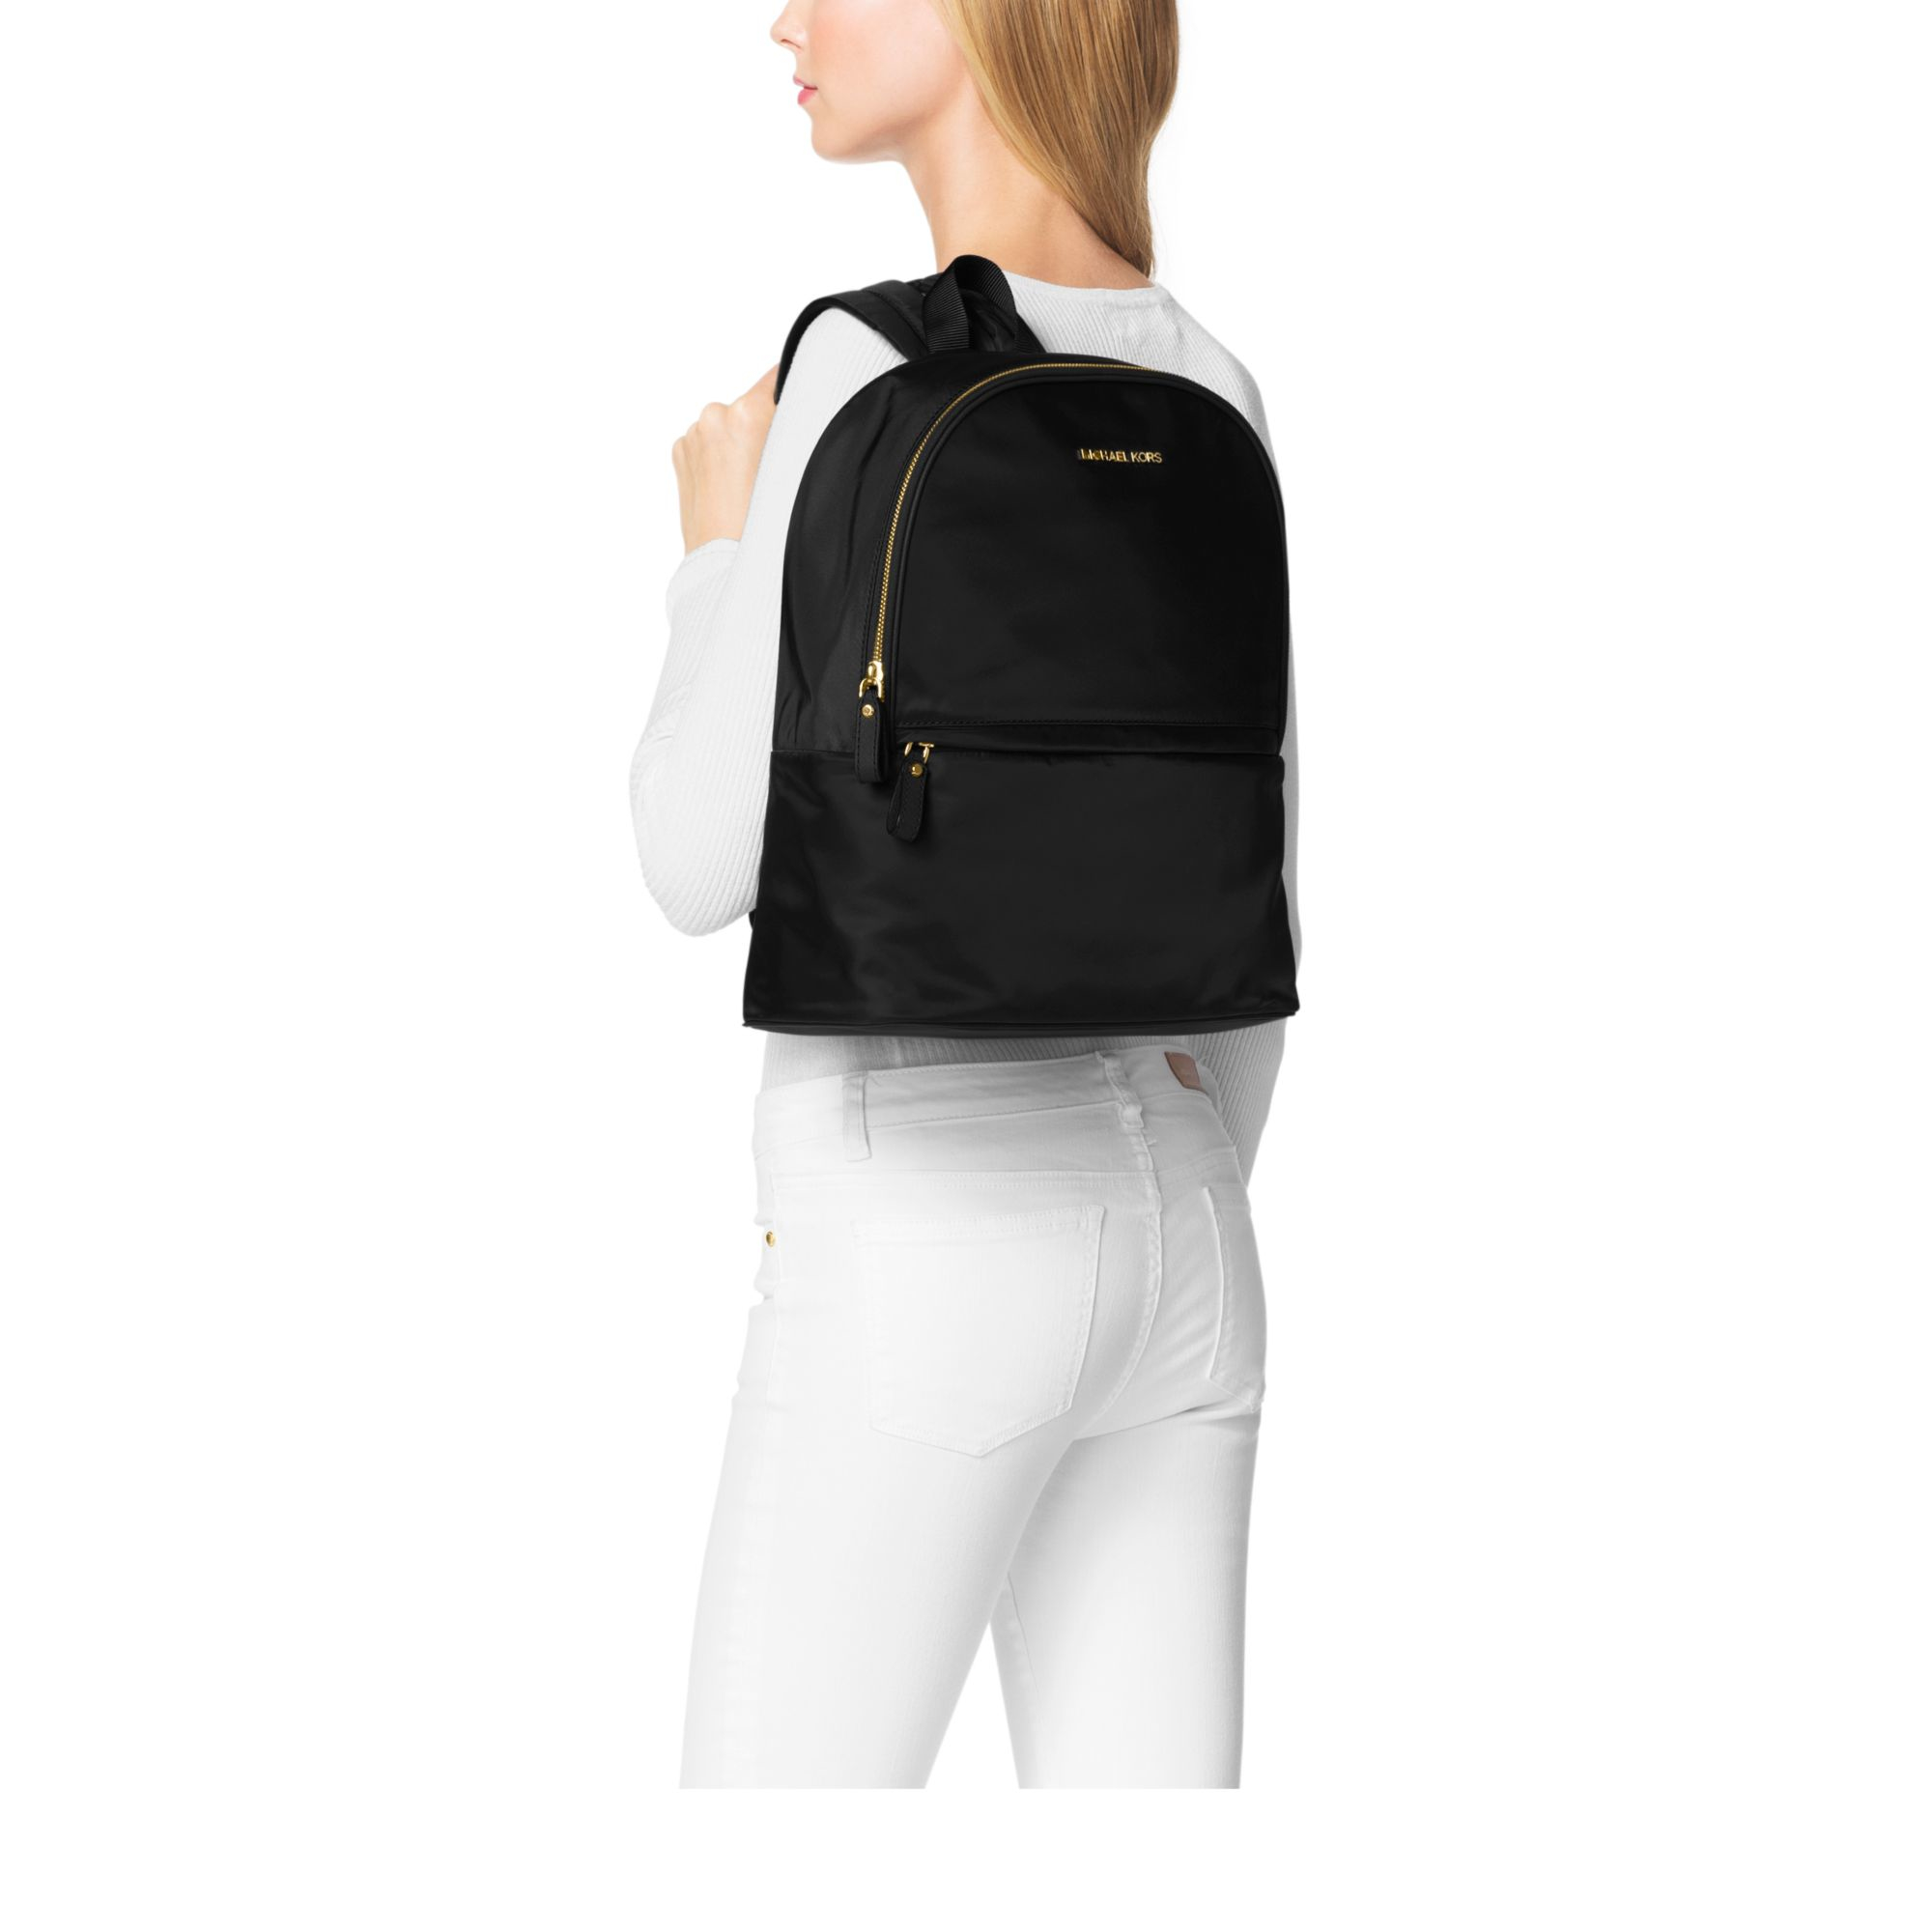 35914b5fb7bcb Lyst - Michael Kors Kieran Large Nylon Backpack in Black